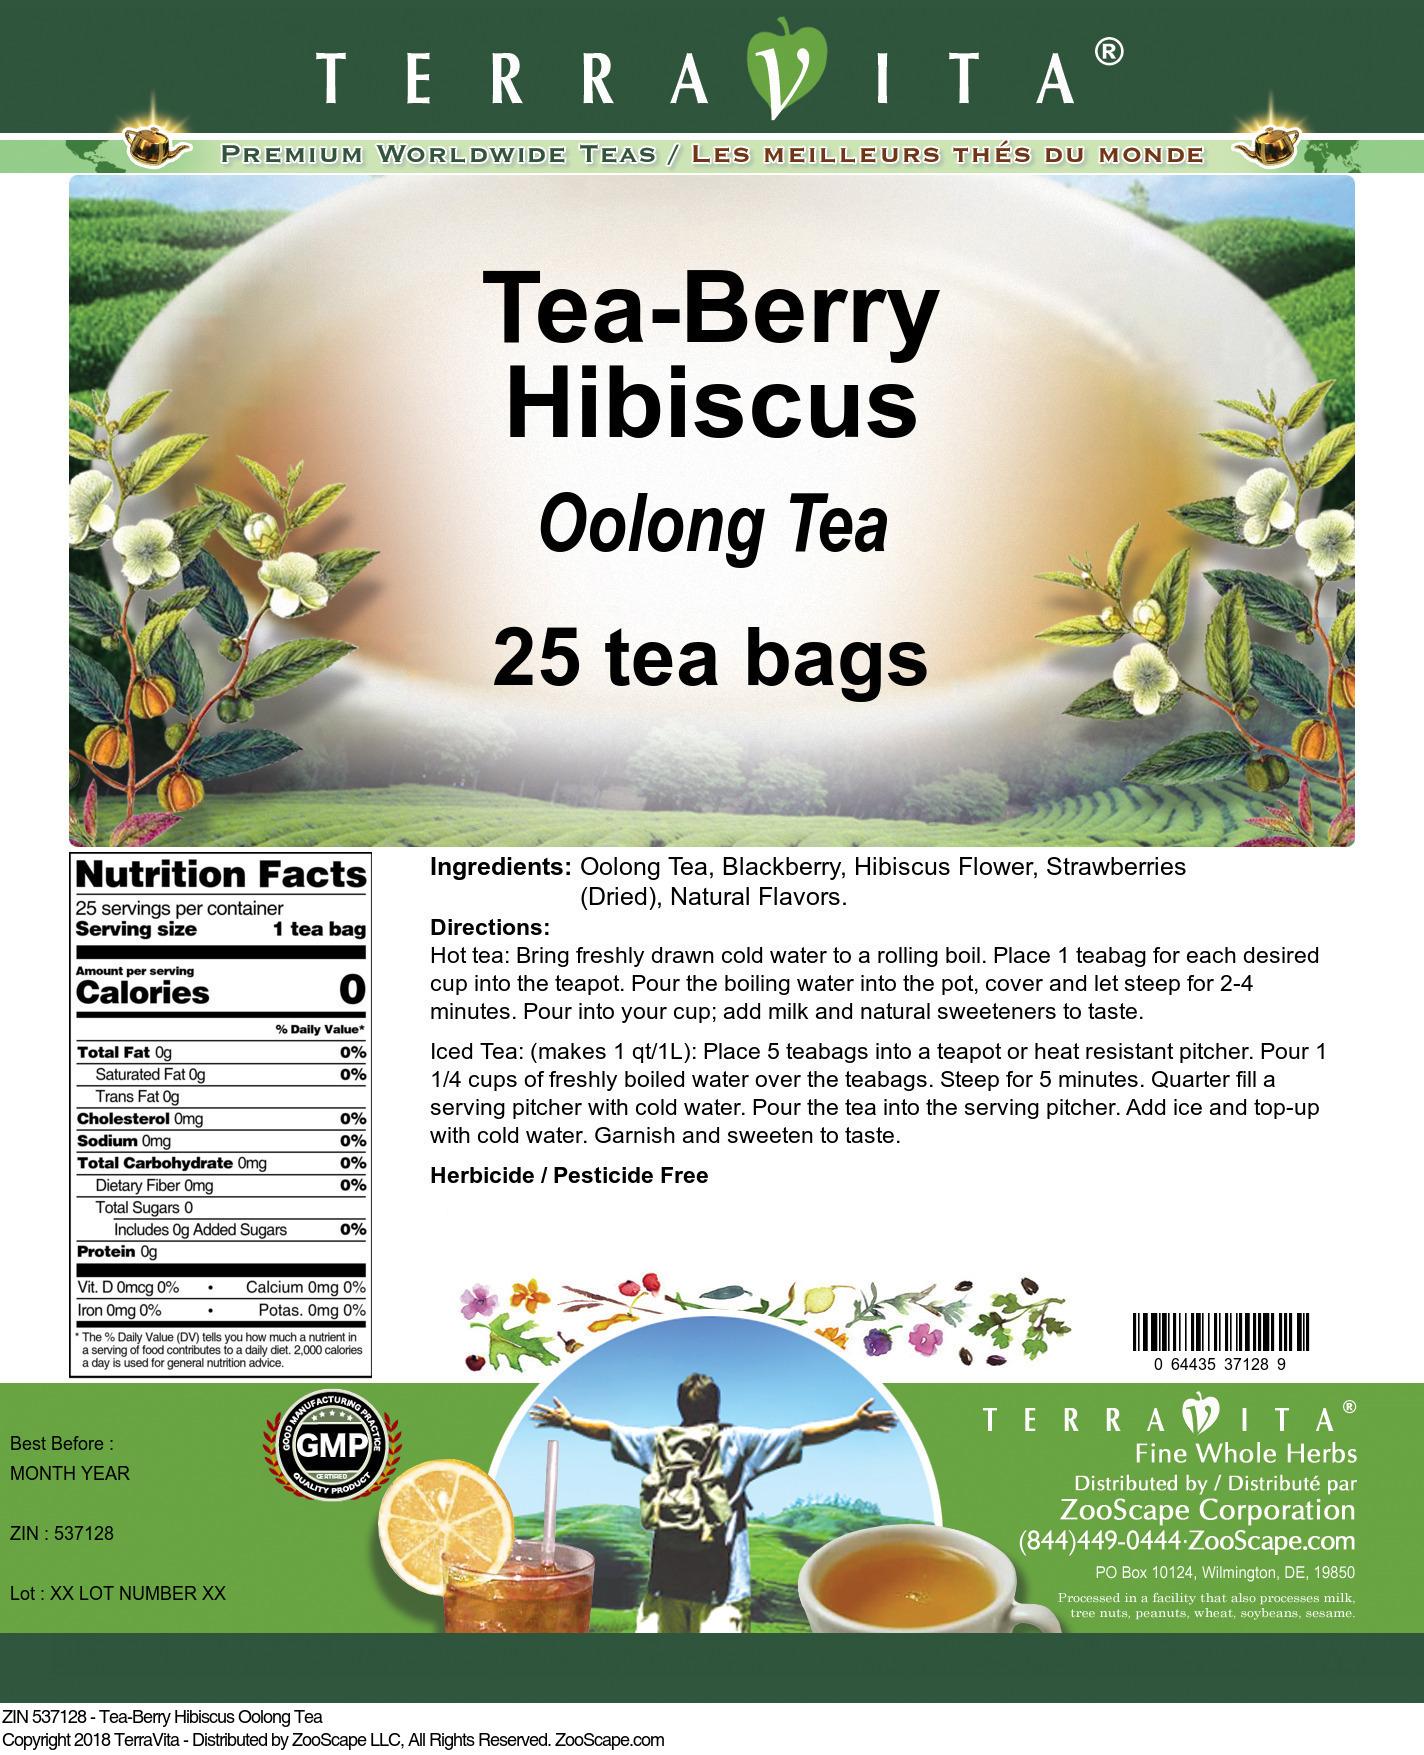 Tea-Berry Hibiscus Oolong Tea